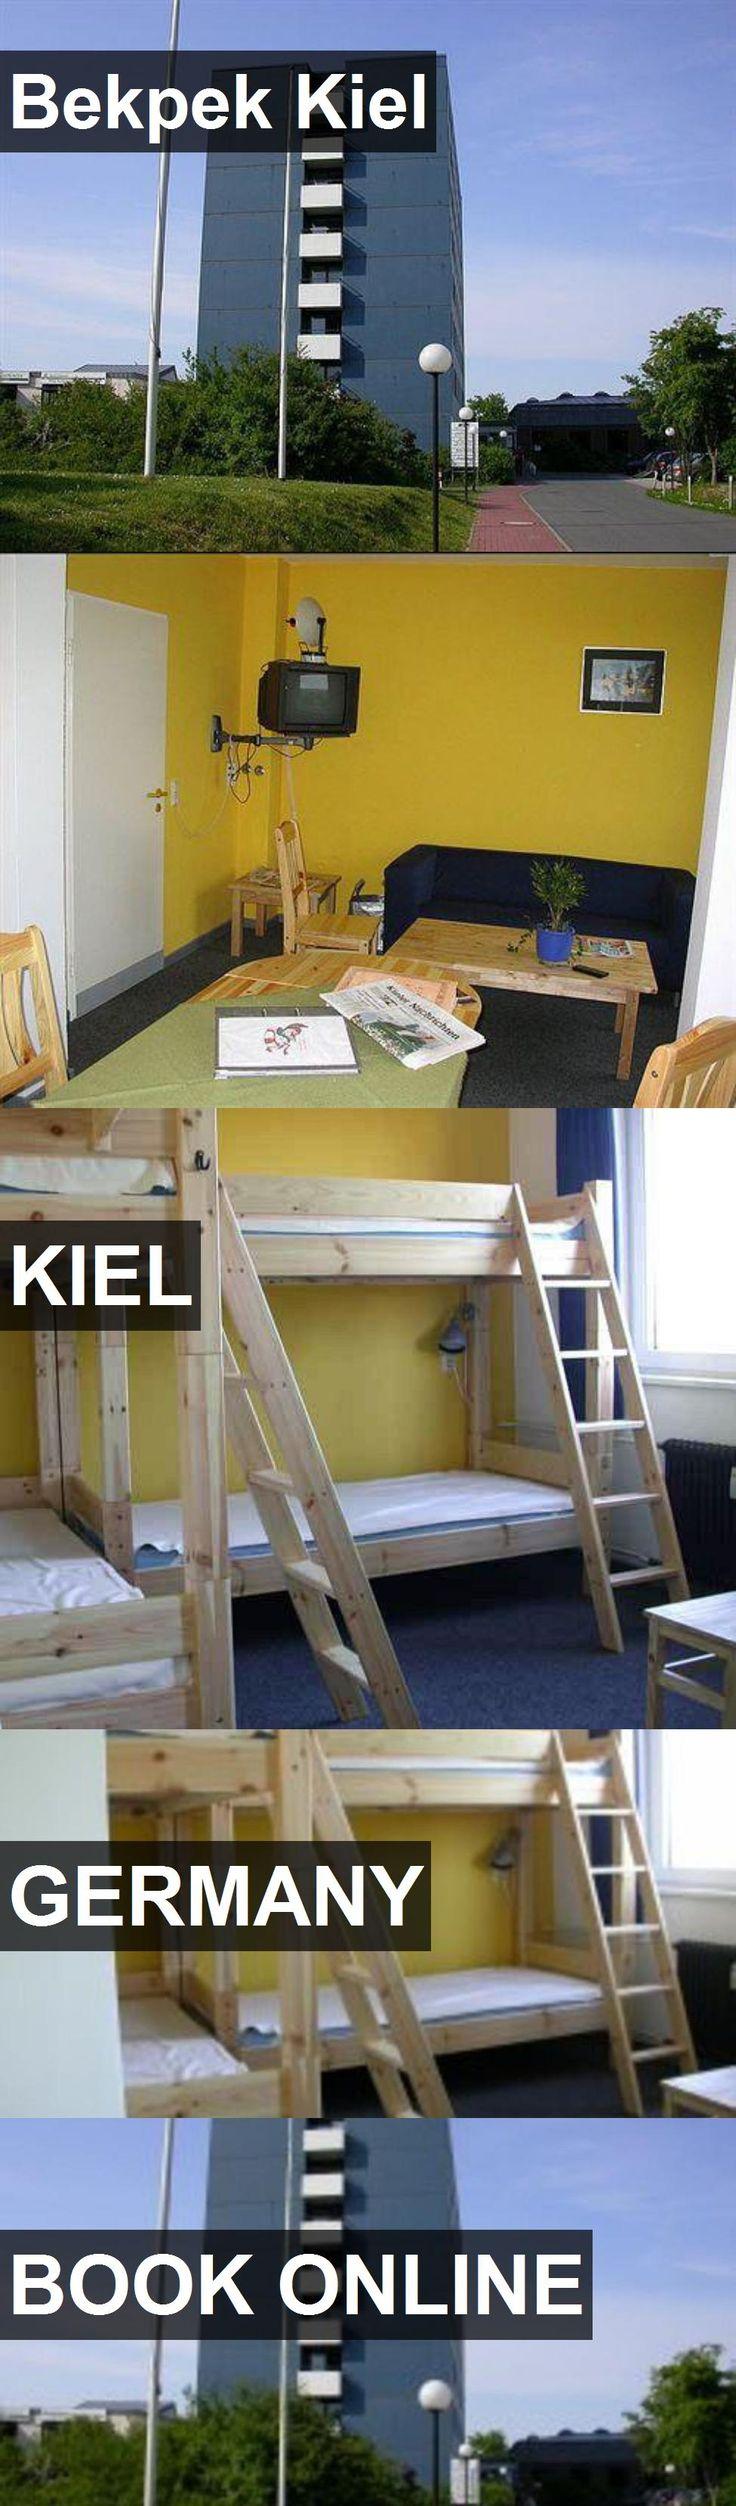 Hotel Bekpek Kiel in Kiel, Germany. For more information, photos, reviews and best prices please follow the link. #Germany #Kiel #travel #vacation #hotel